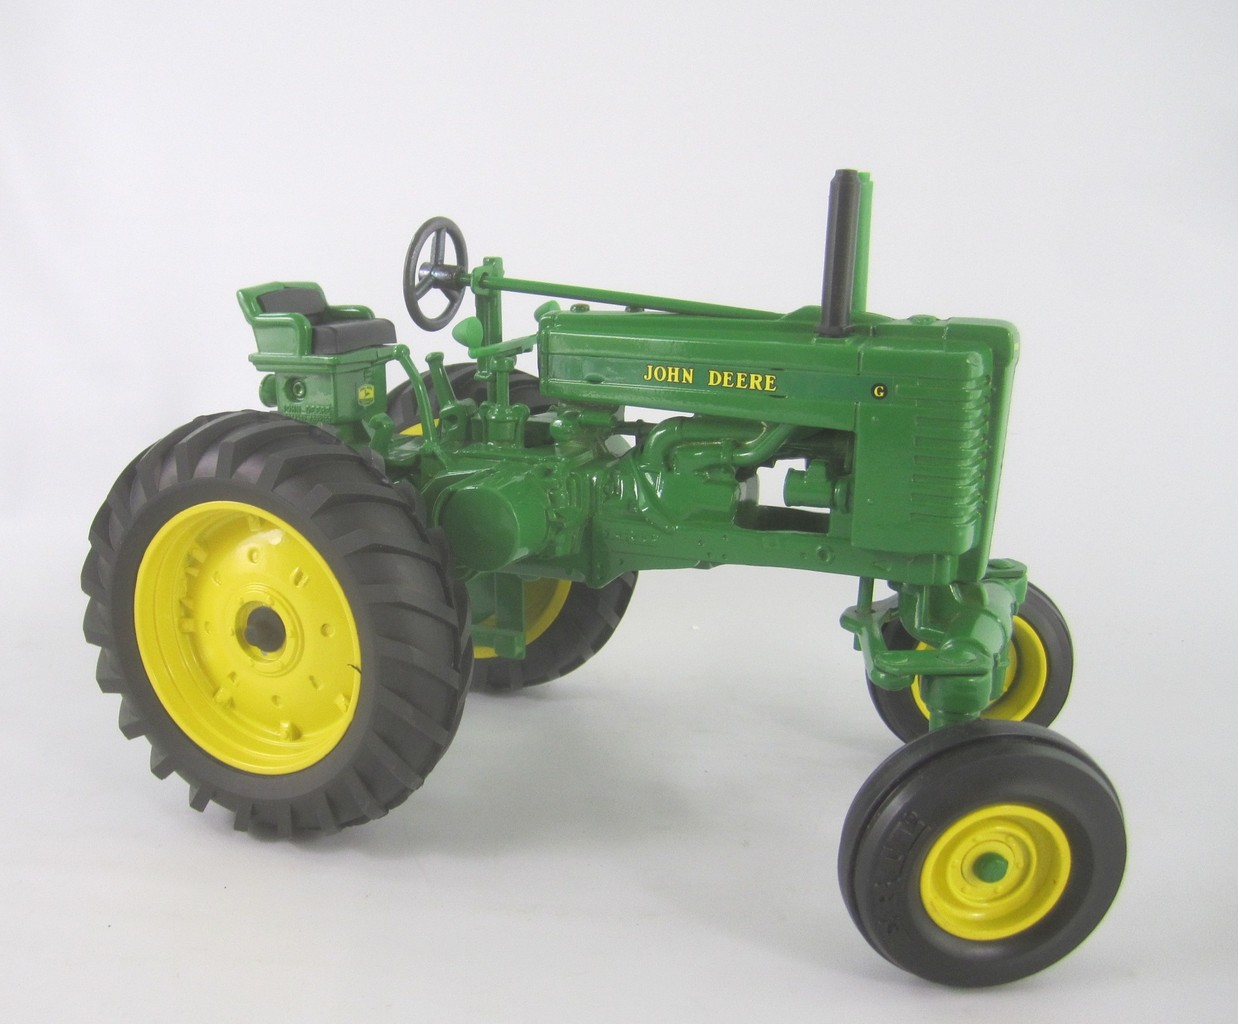 For Sale John Deere Letter Series Farm Toys - Arizona ...